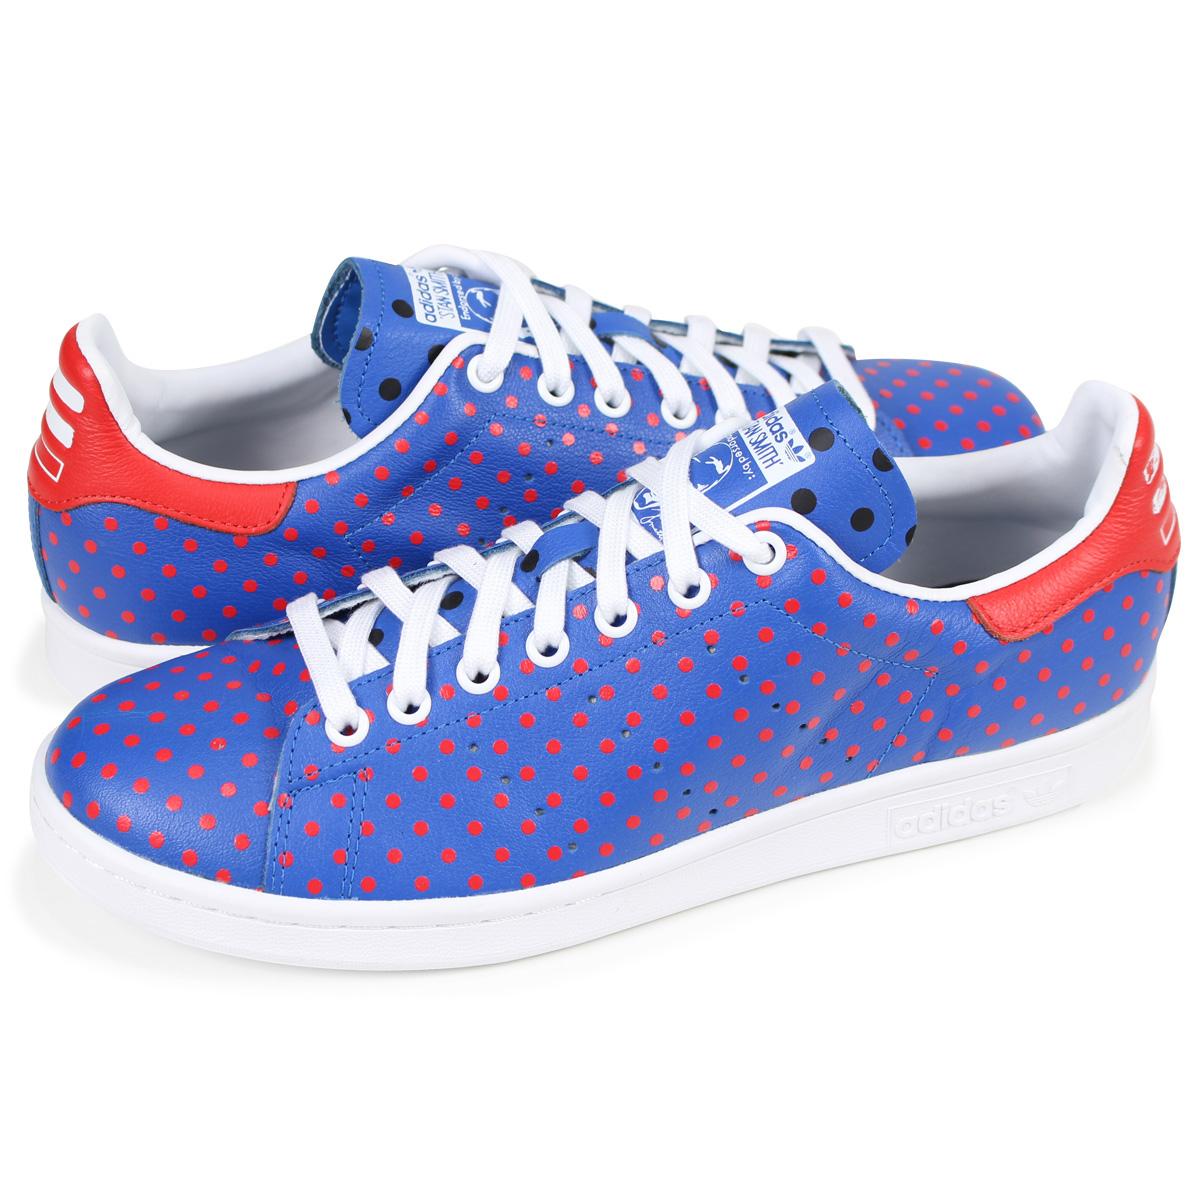 66e46527fdbe56 Whats up Sports  adidas Originals PW STAN SMITH SPD Adidas Stan ...